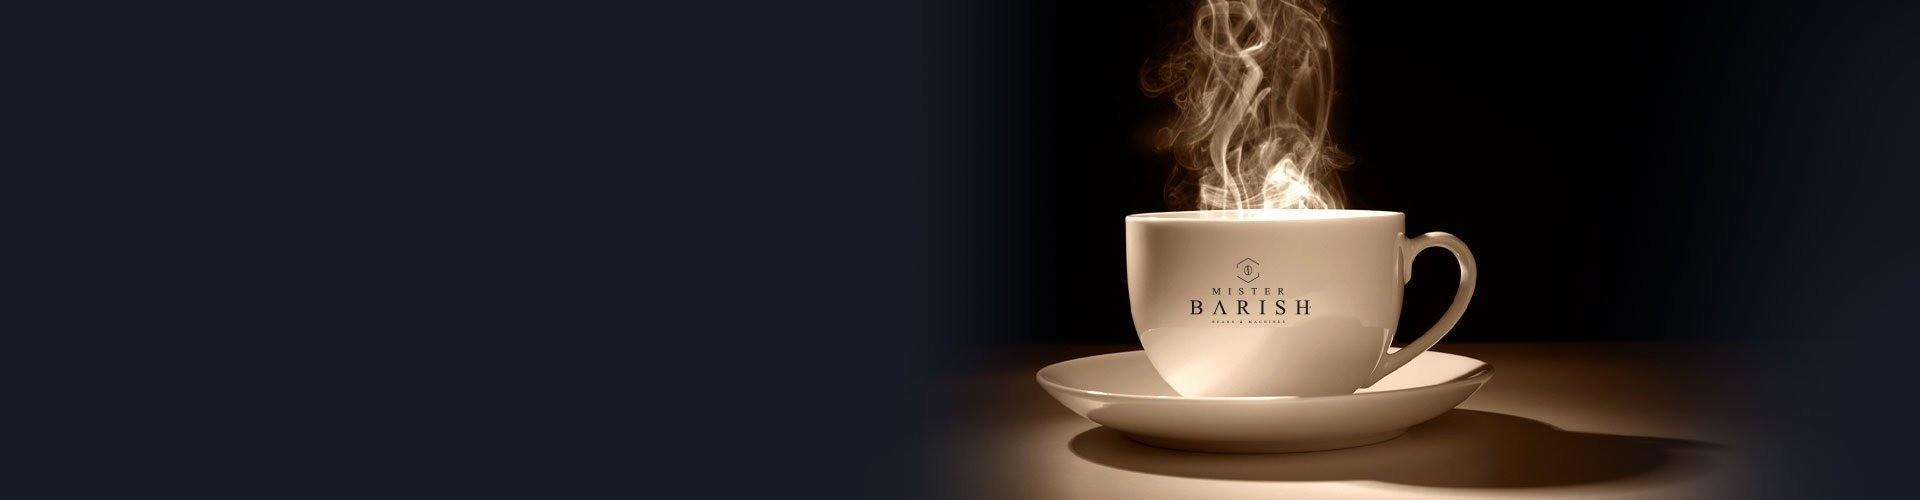 Koffie thuis met Mister Barish